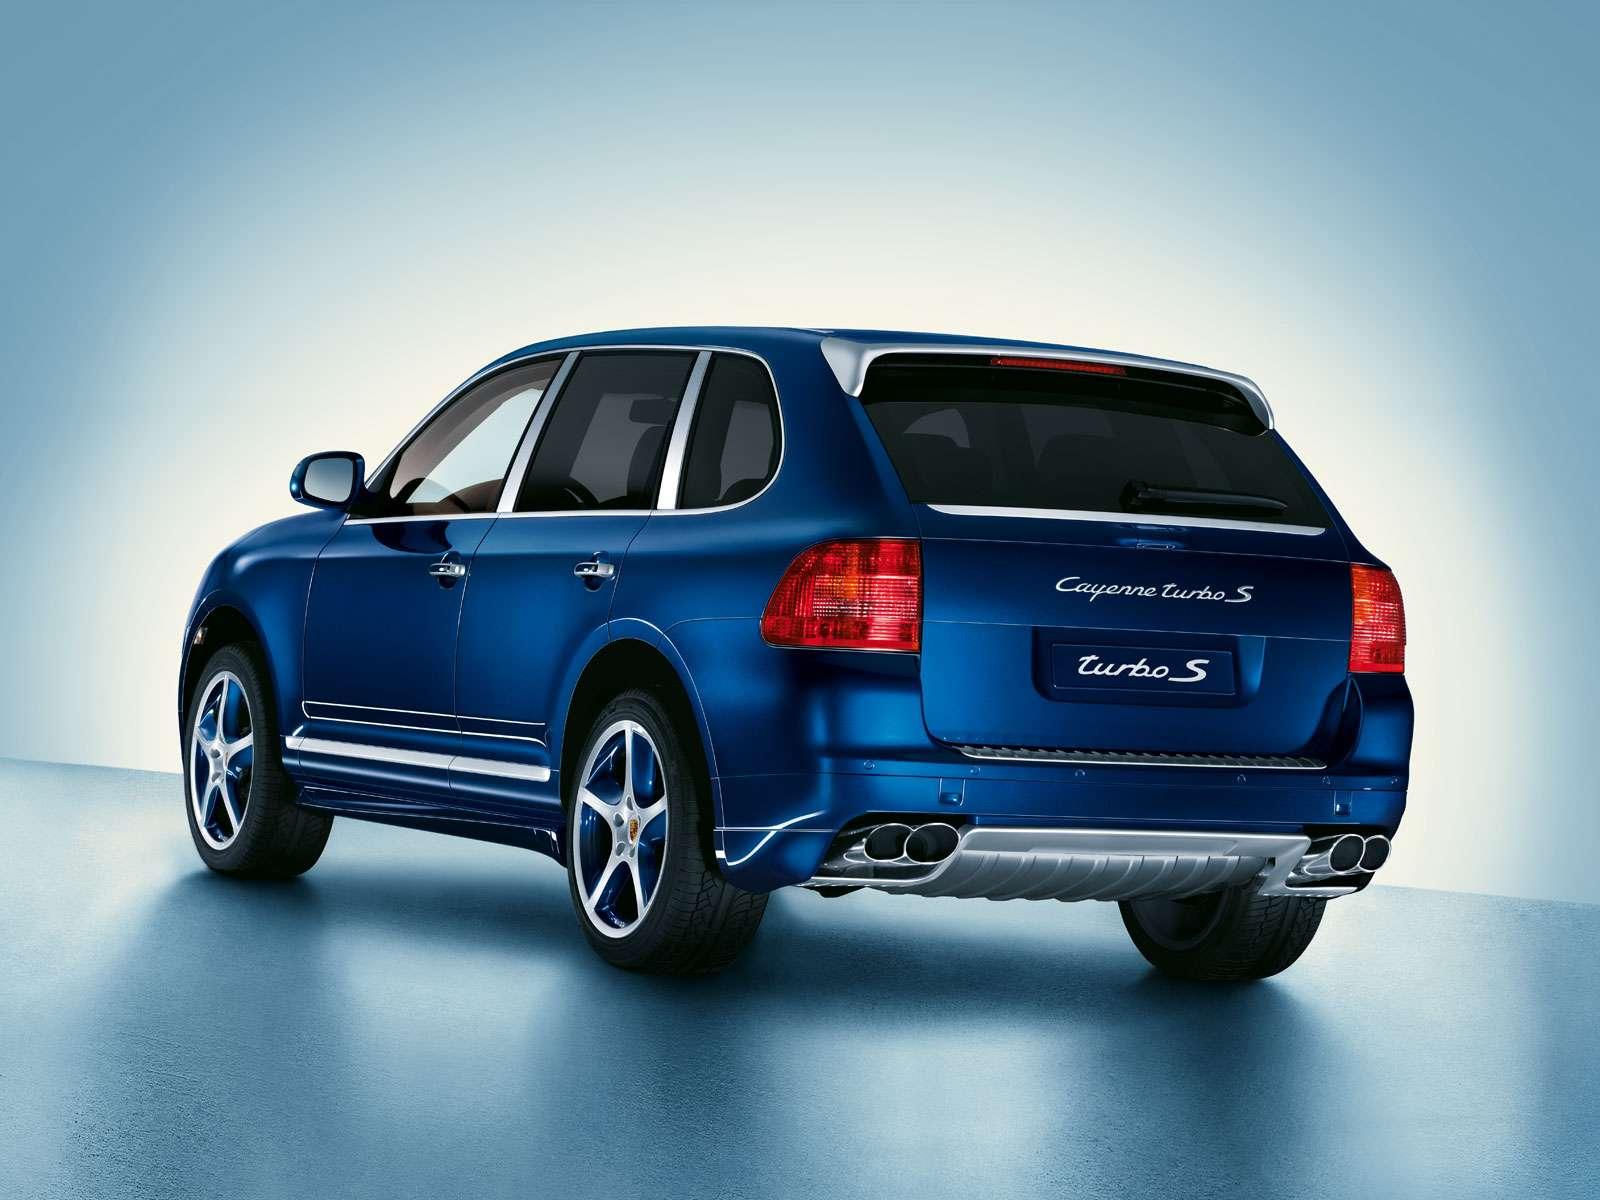 porsche cayenne turbo s marineblau perleffekt only cars and cars. Black Bedroom Furniture Sets. Home Design Ideas